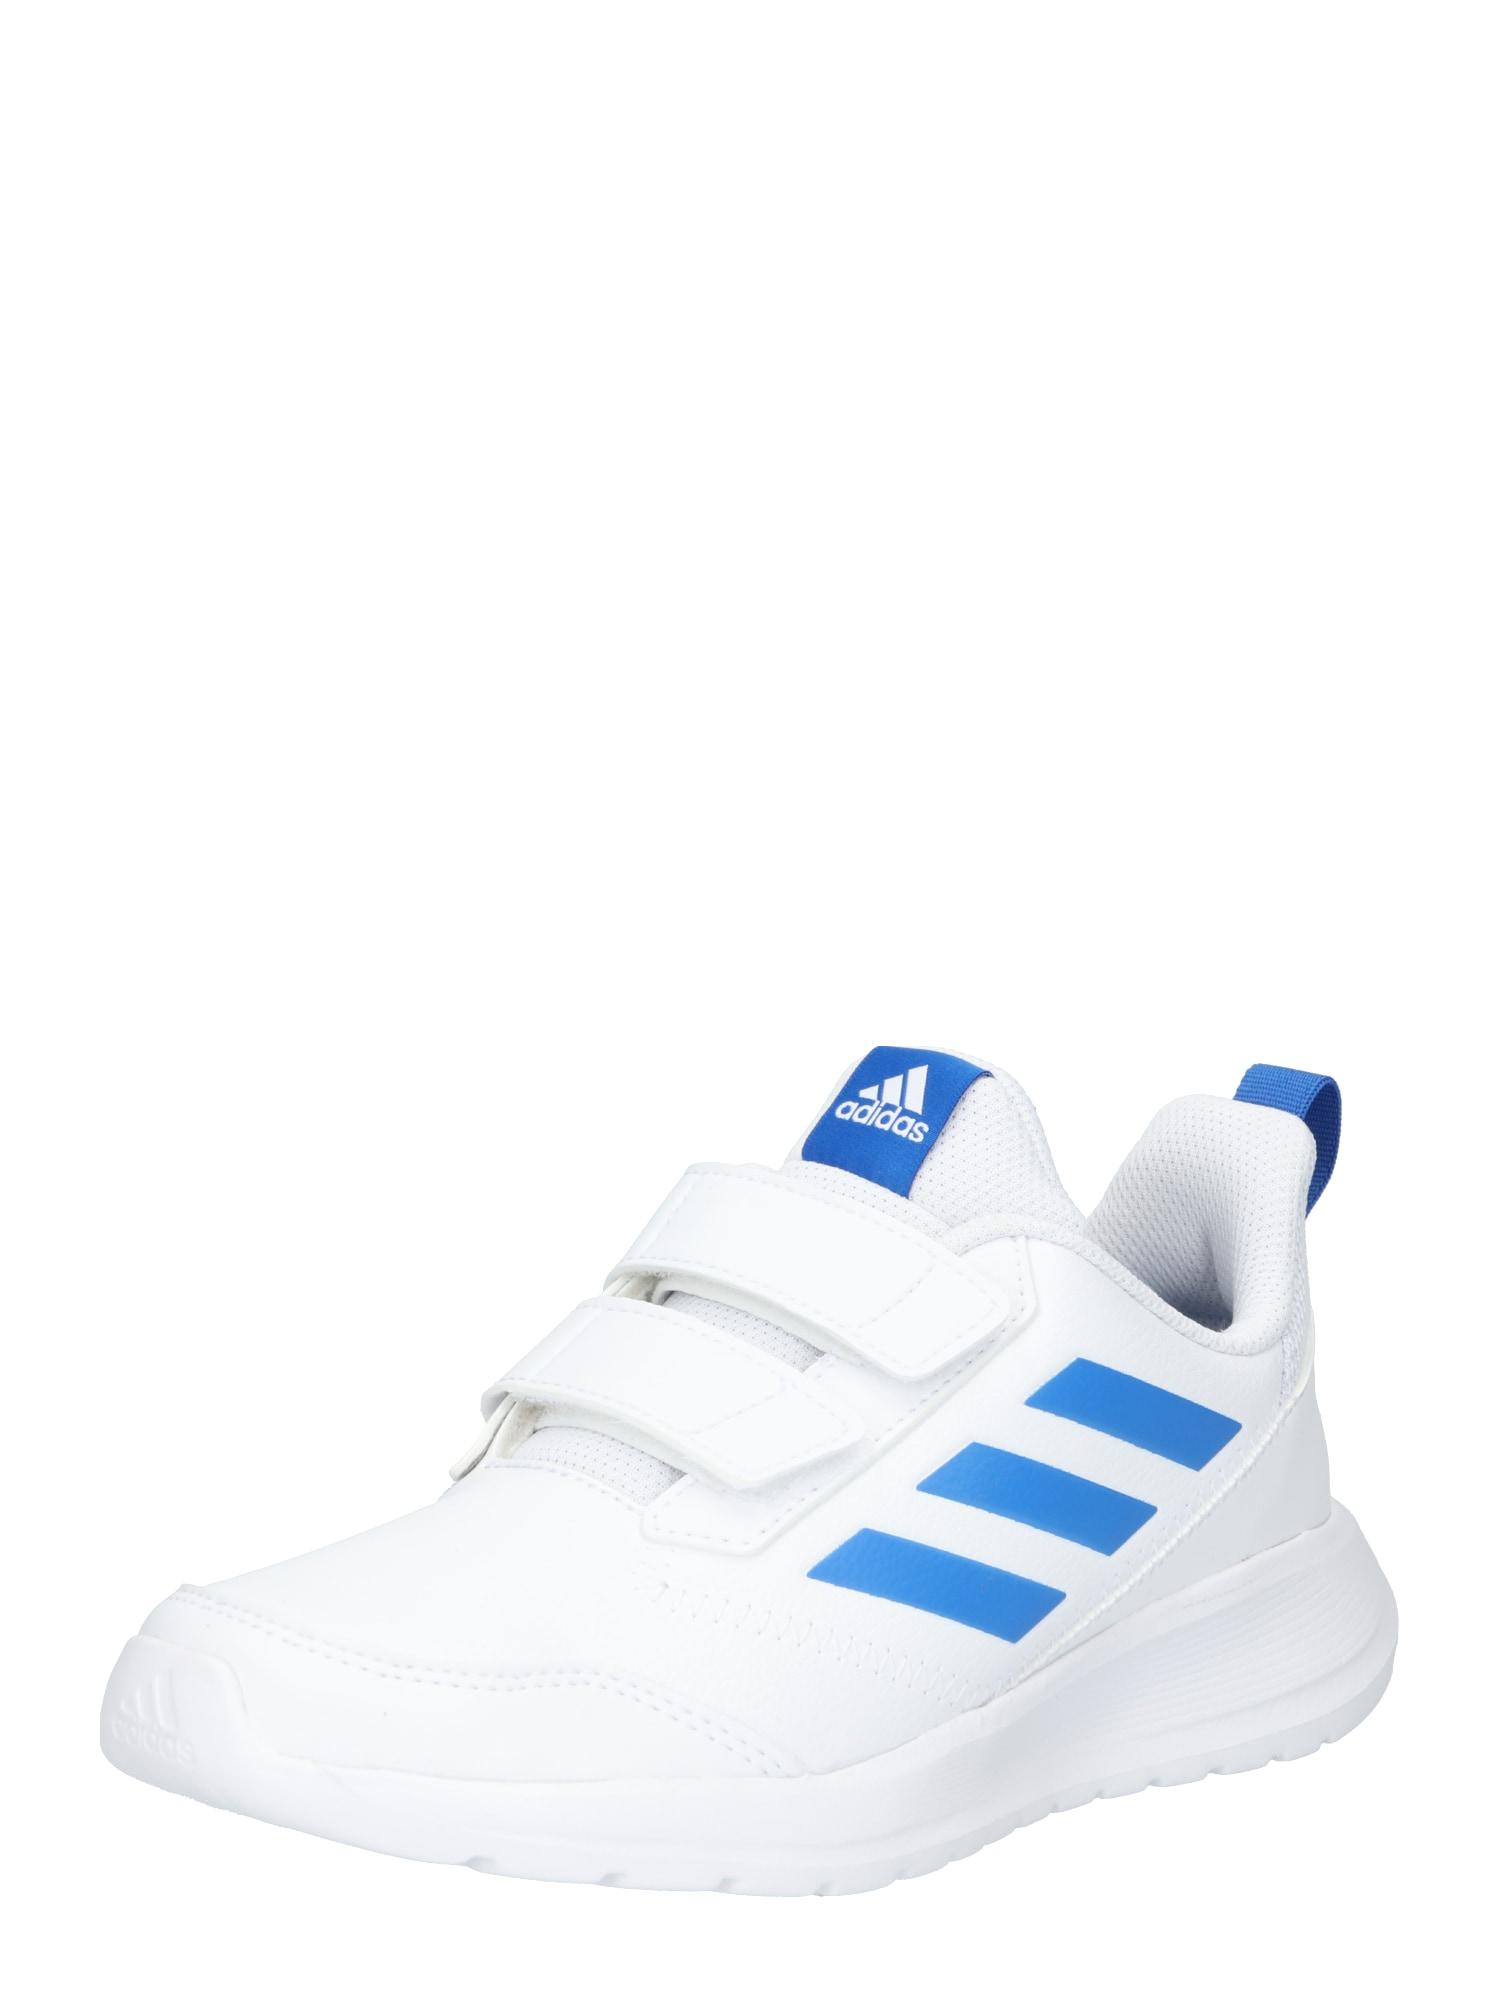 Sportovní boty AltaRun CF K modrá bílá ADIDAS PERFORMANCE